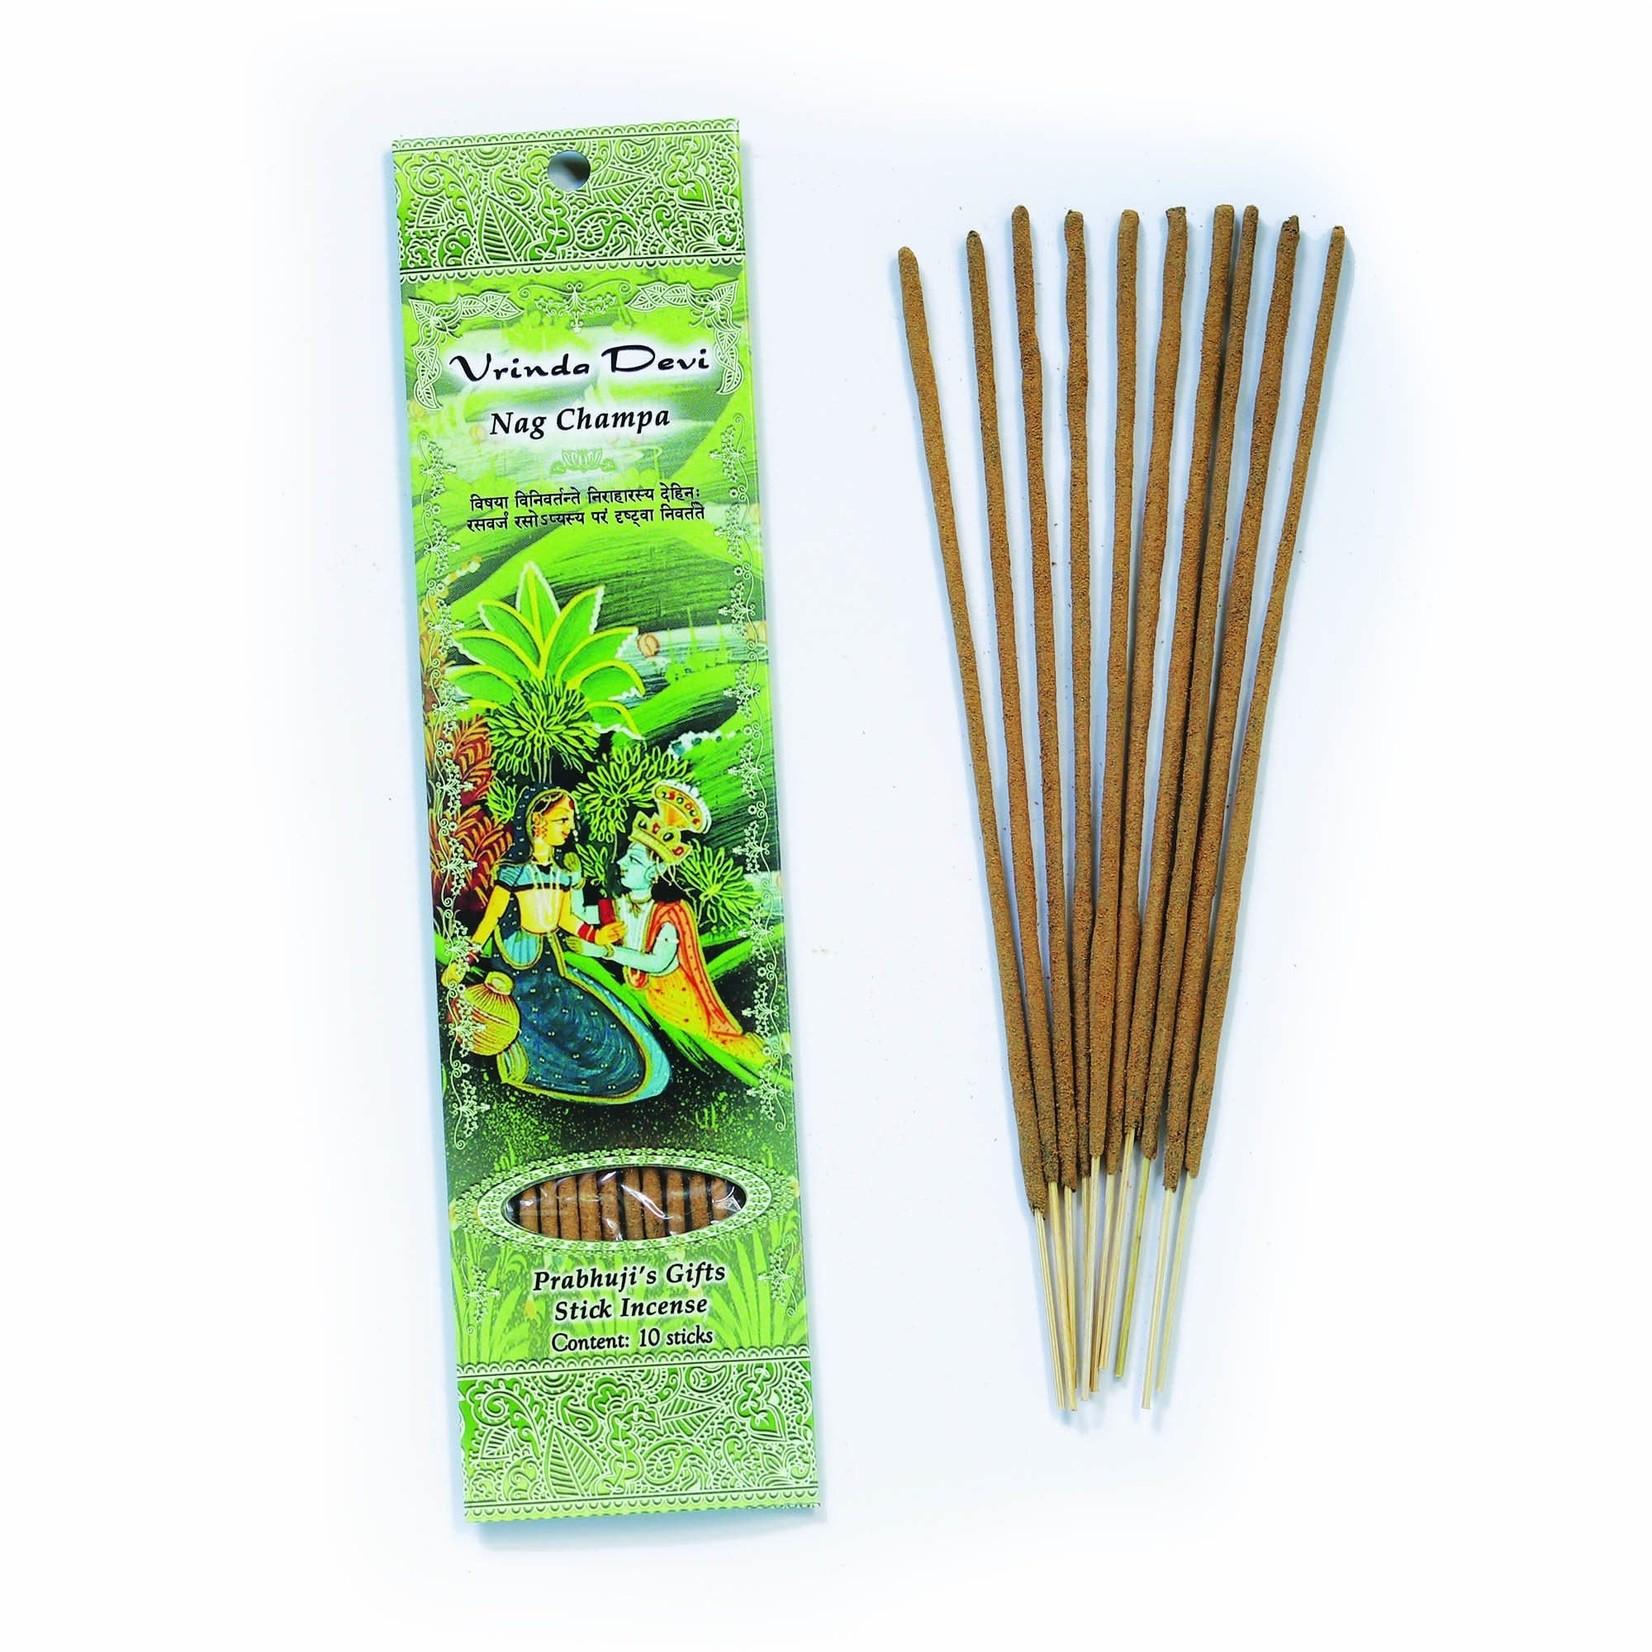 Prabhujis Gifts Vrinda Devi - Nag Champa Incense Stick